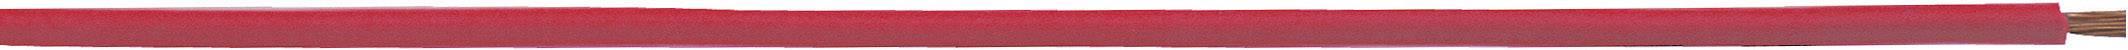 Opletenie / lanko LappKabel 4510031 H05V-K, 1 x 0.50 mm², vonkajší Ø 2.10 mm, 100 m, hnedá